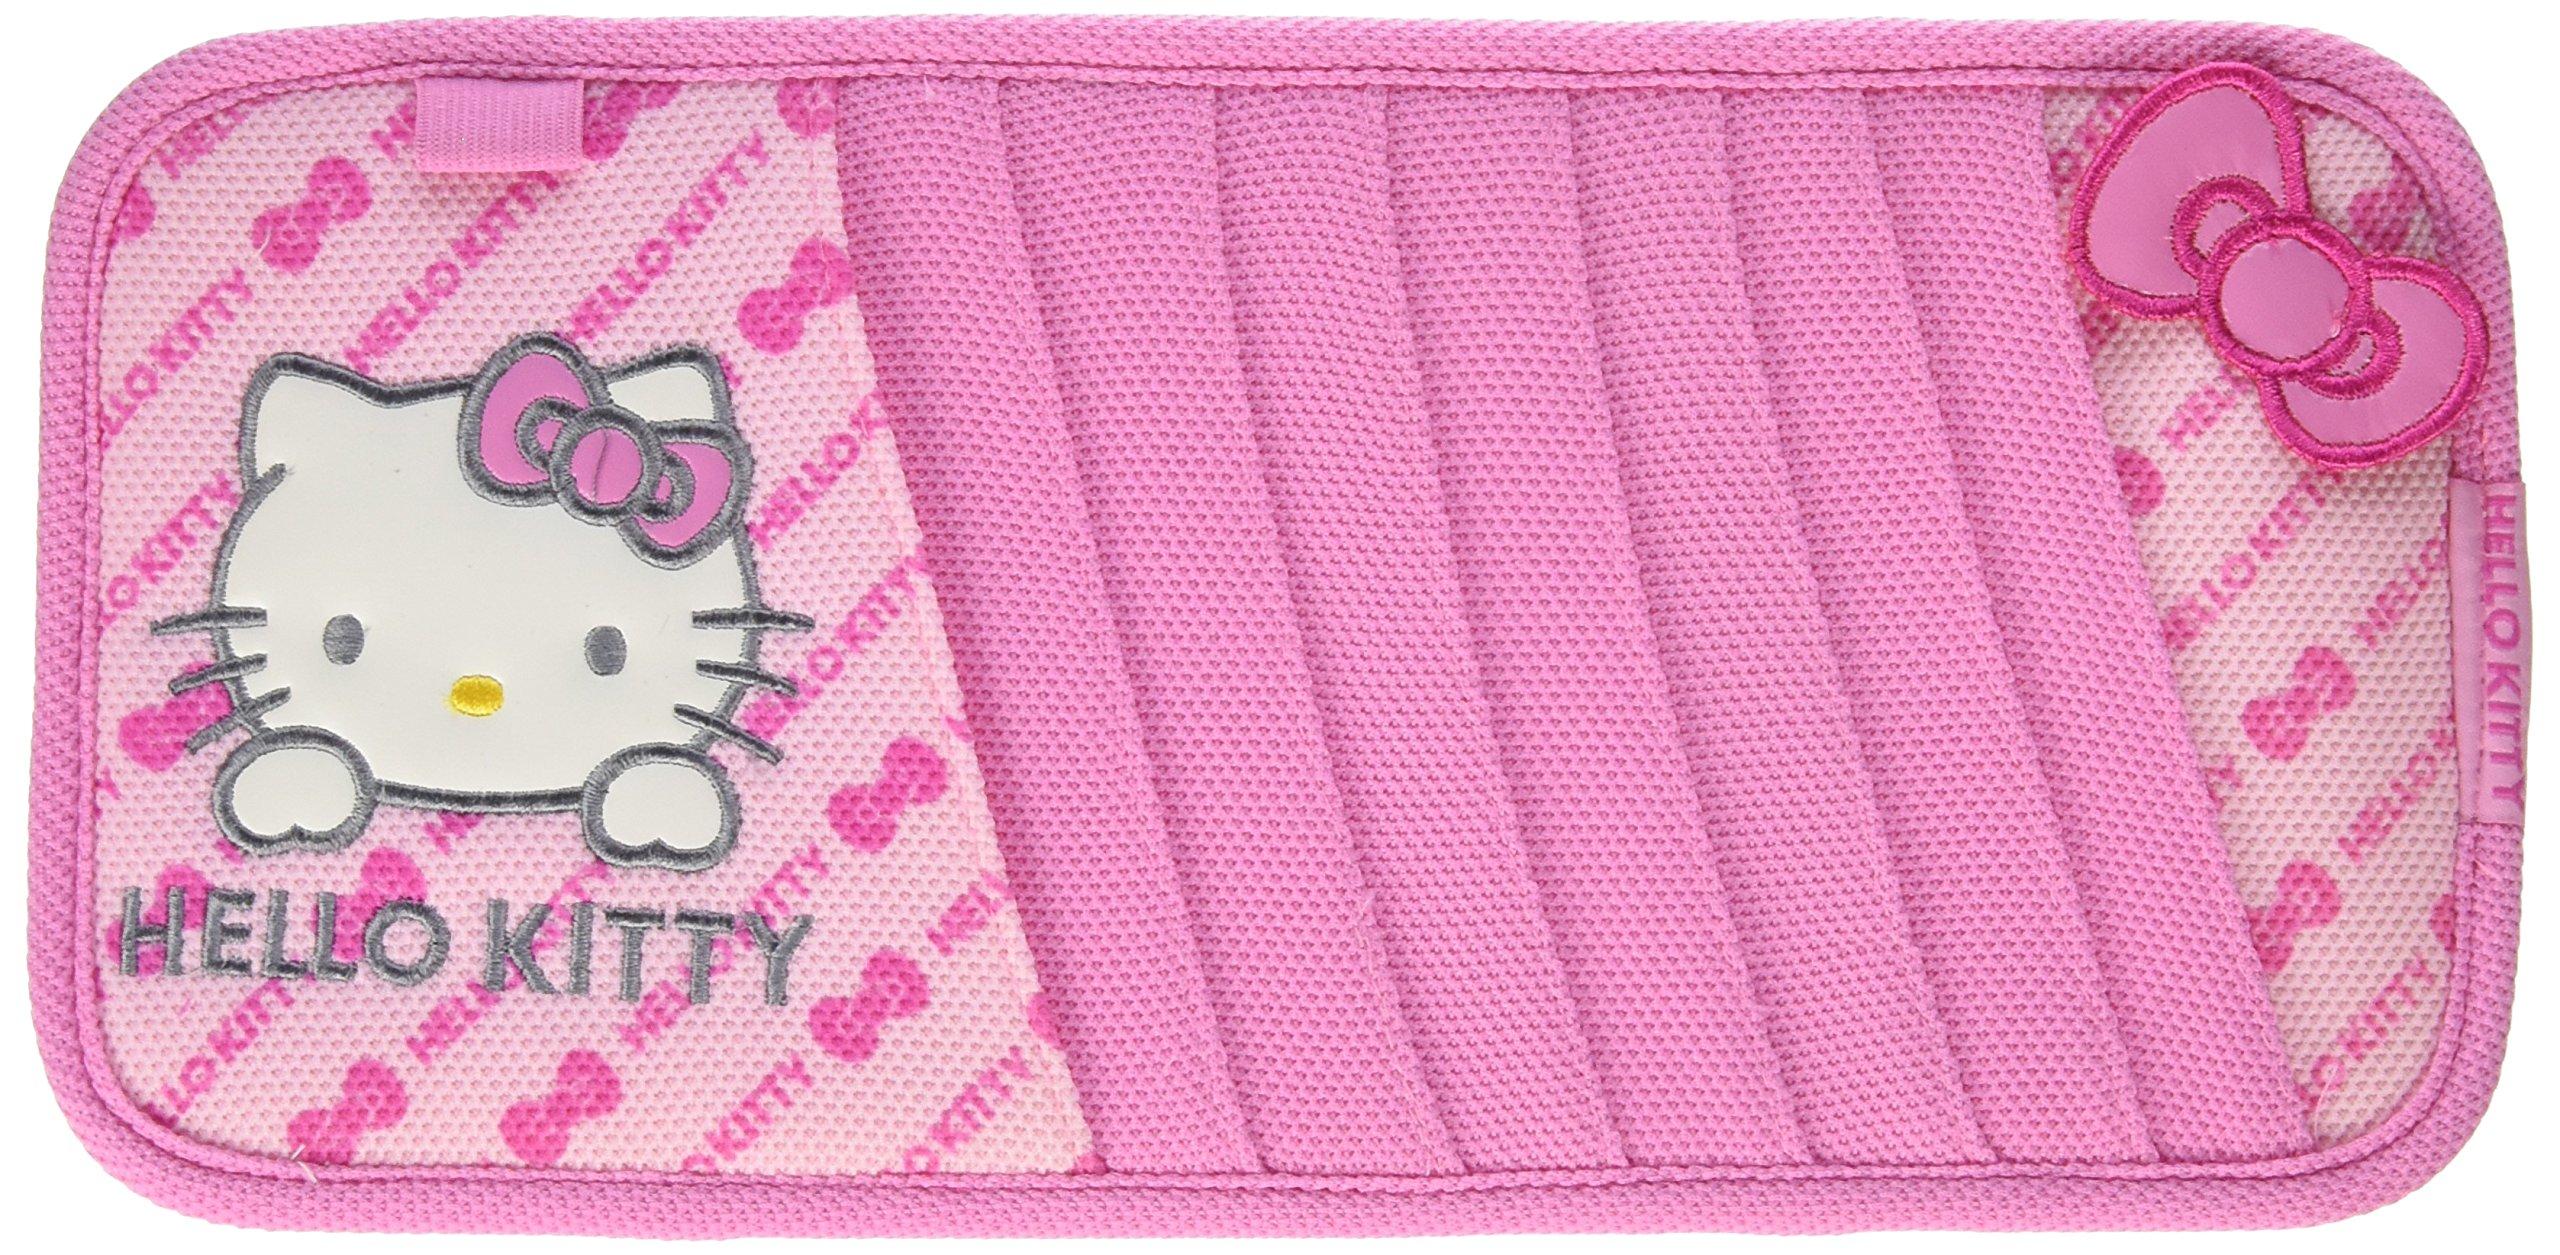 Hello Kitty Sanrio Bows Pink CD Visor Organizer by Sanrio